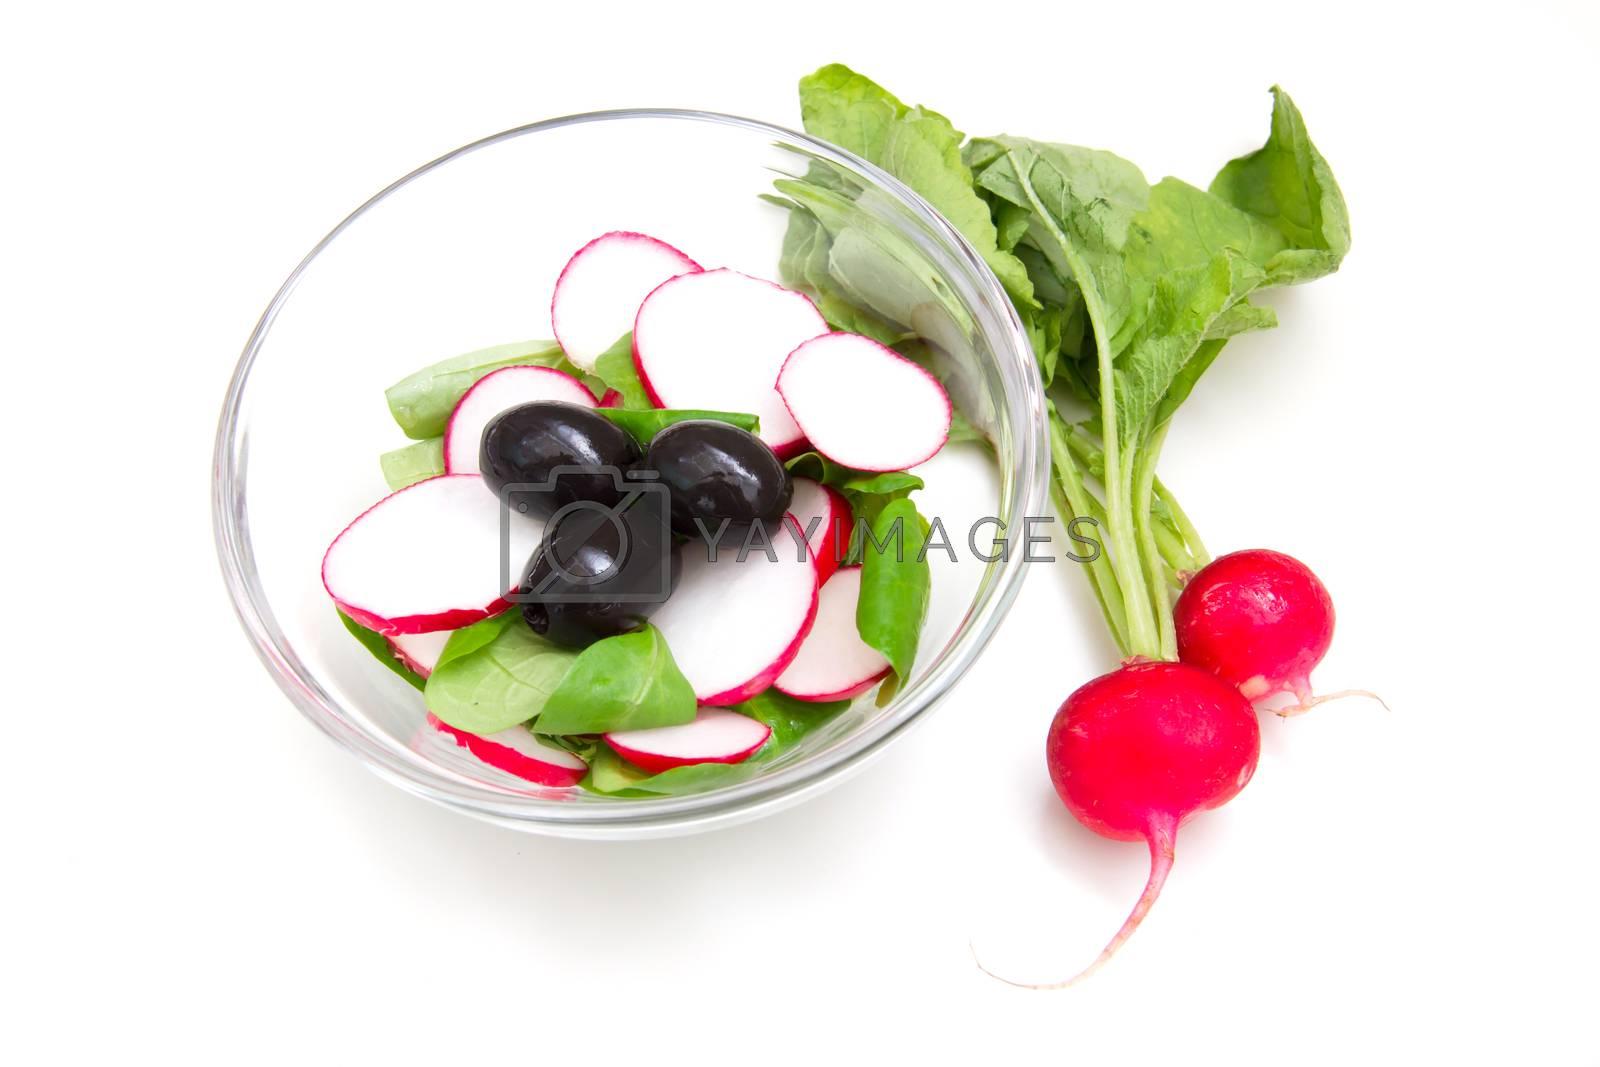 Salad radishes in bowl on white background